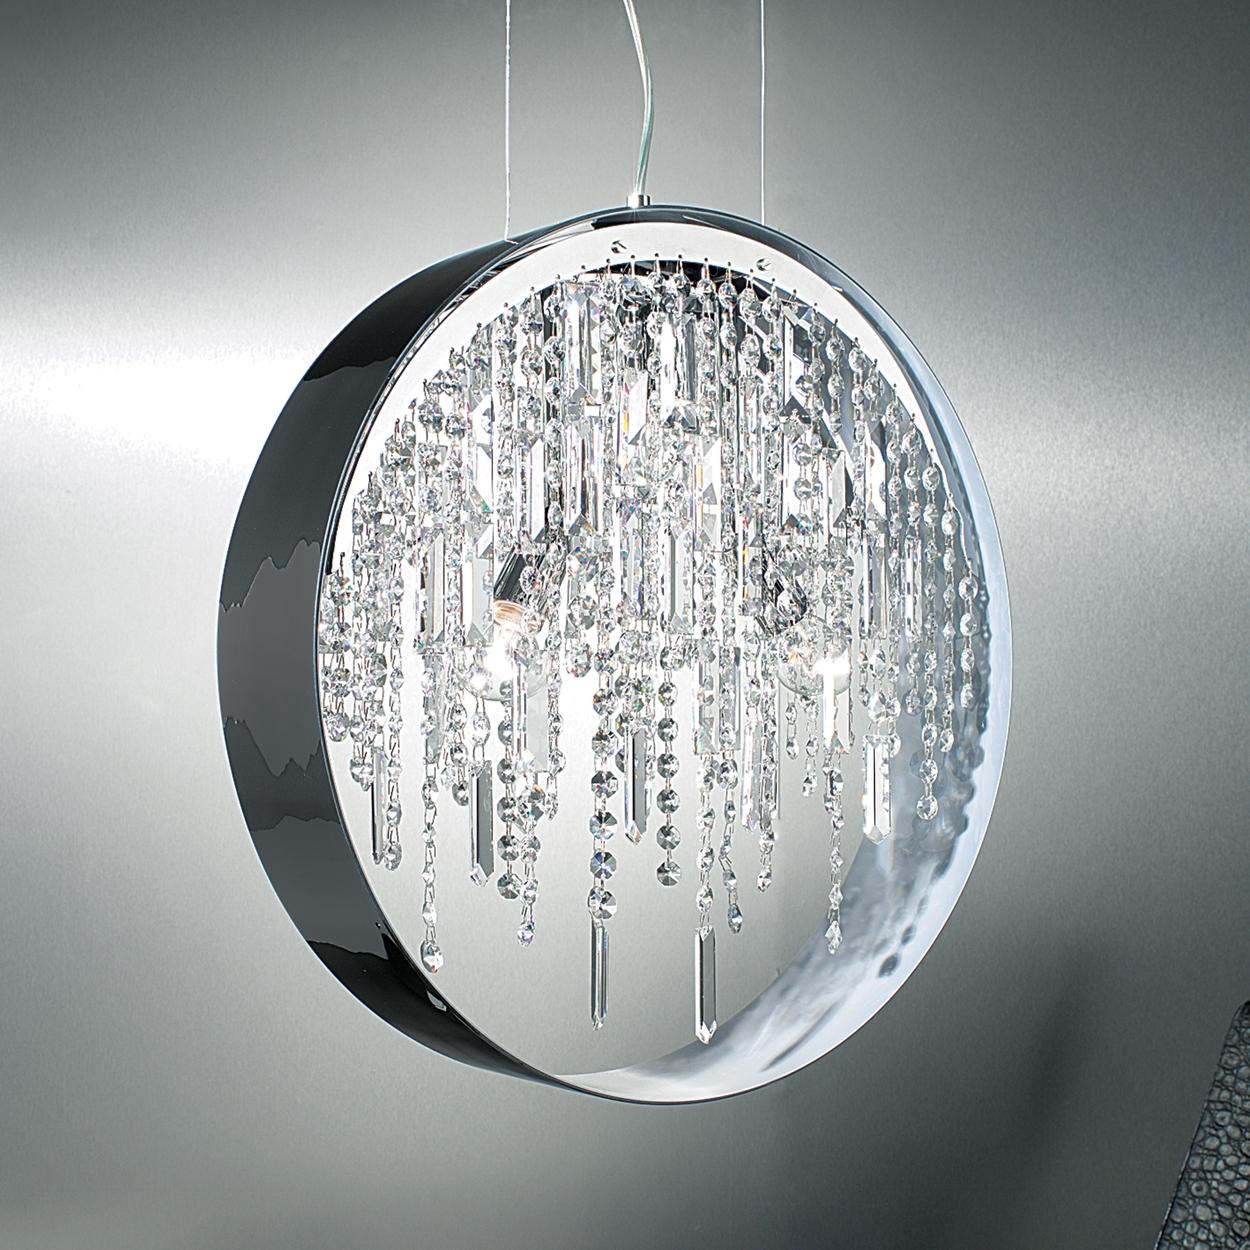 Stylish Modern Chandelier Lighting (View 10 of 15)